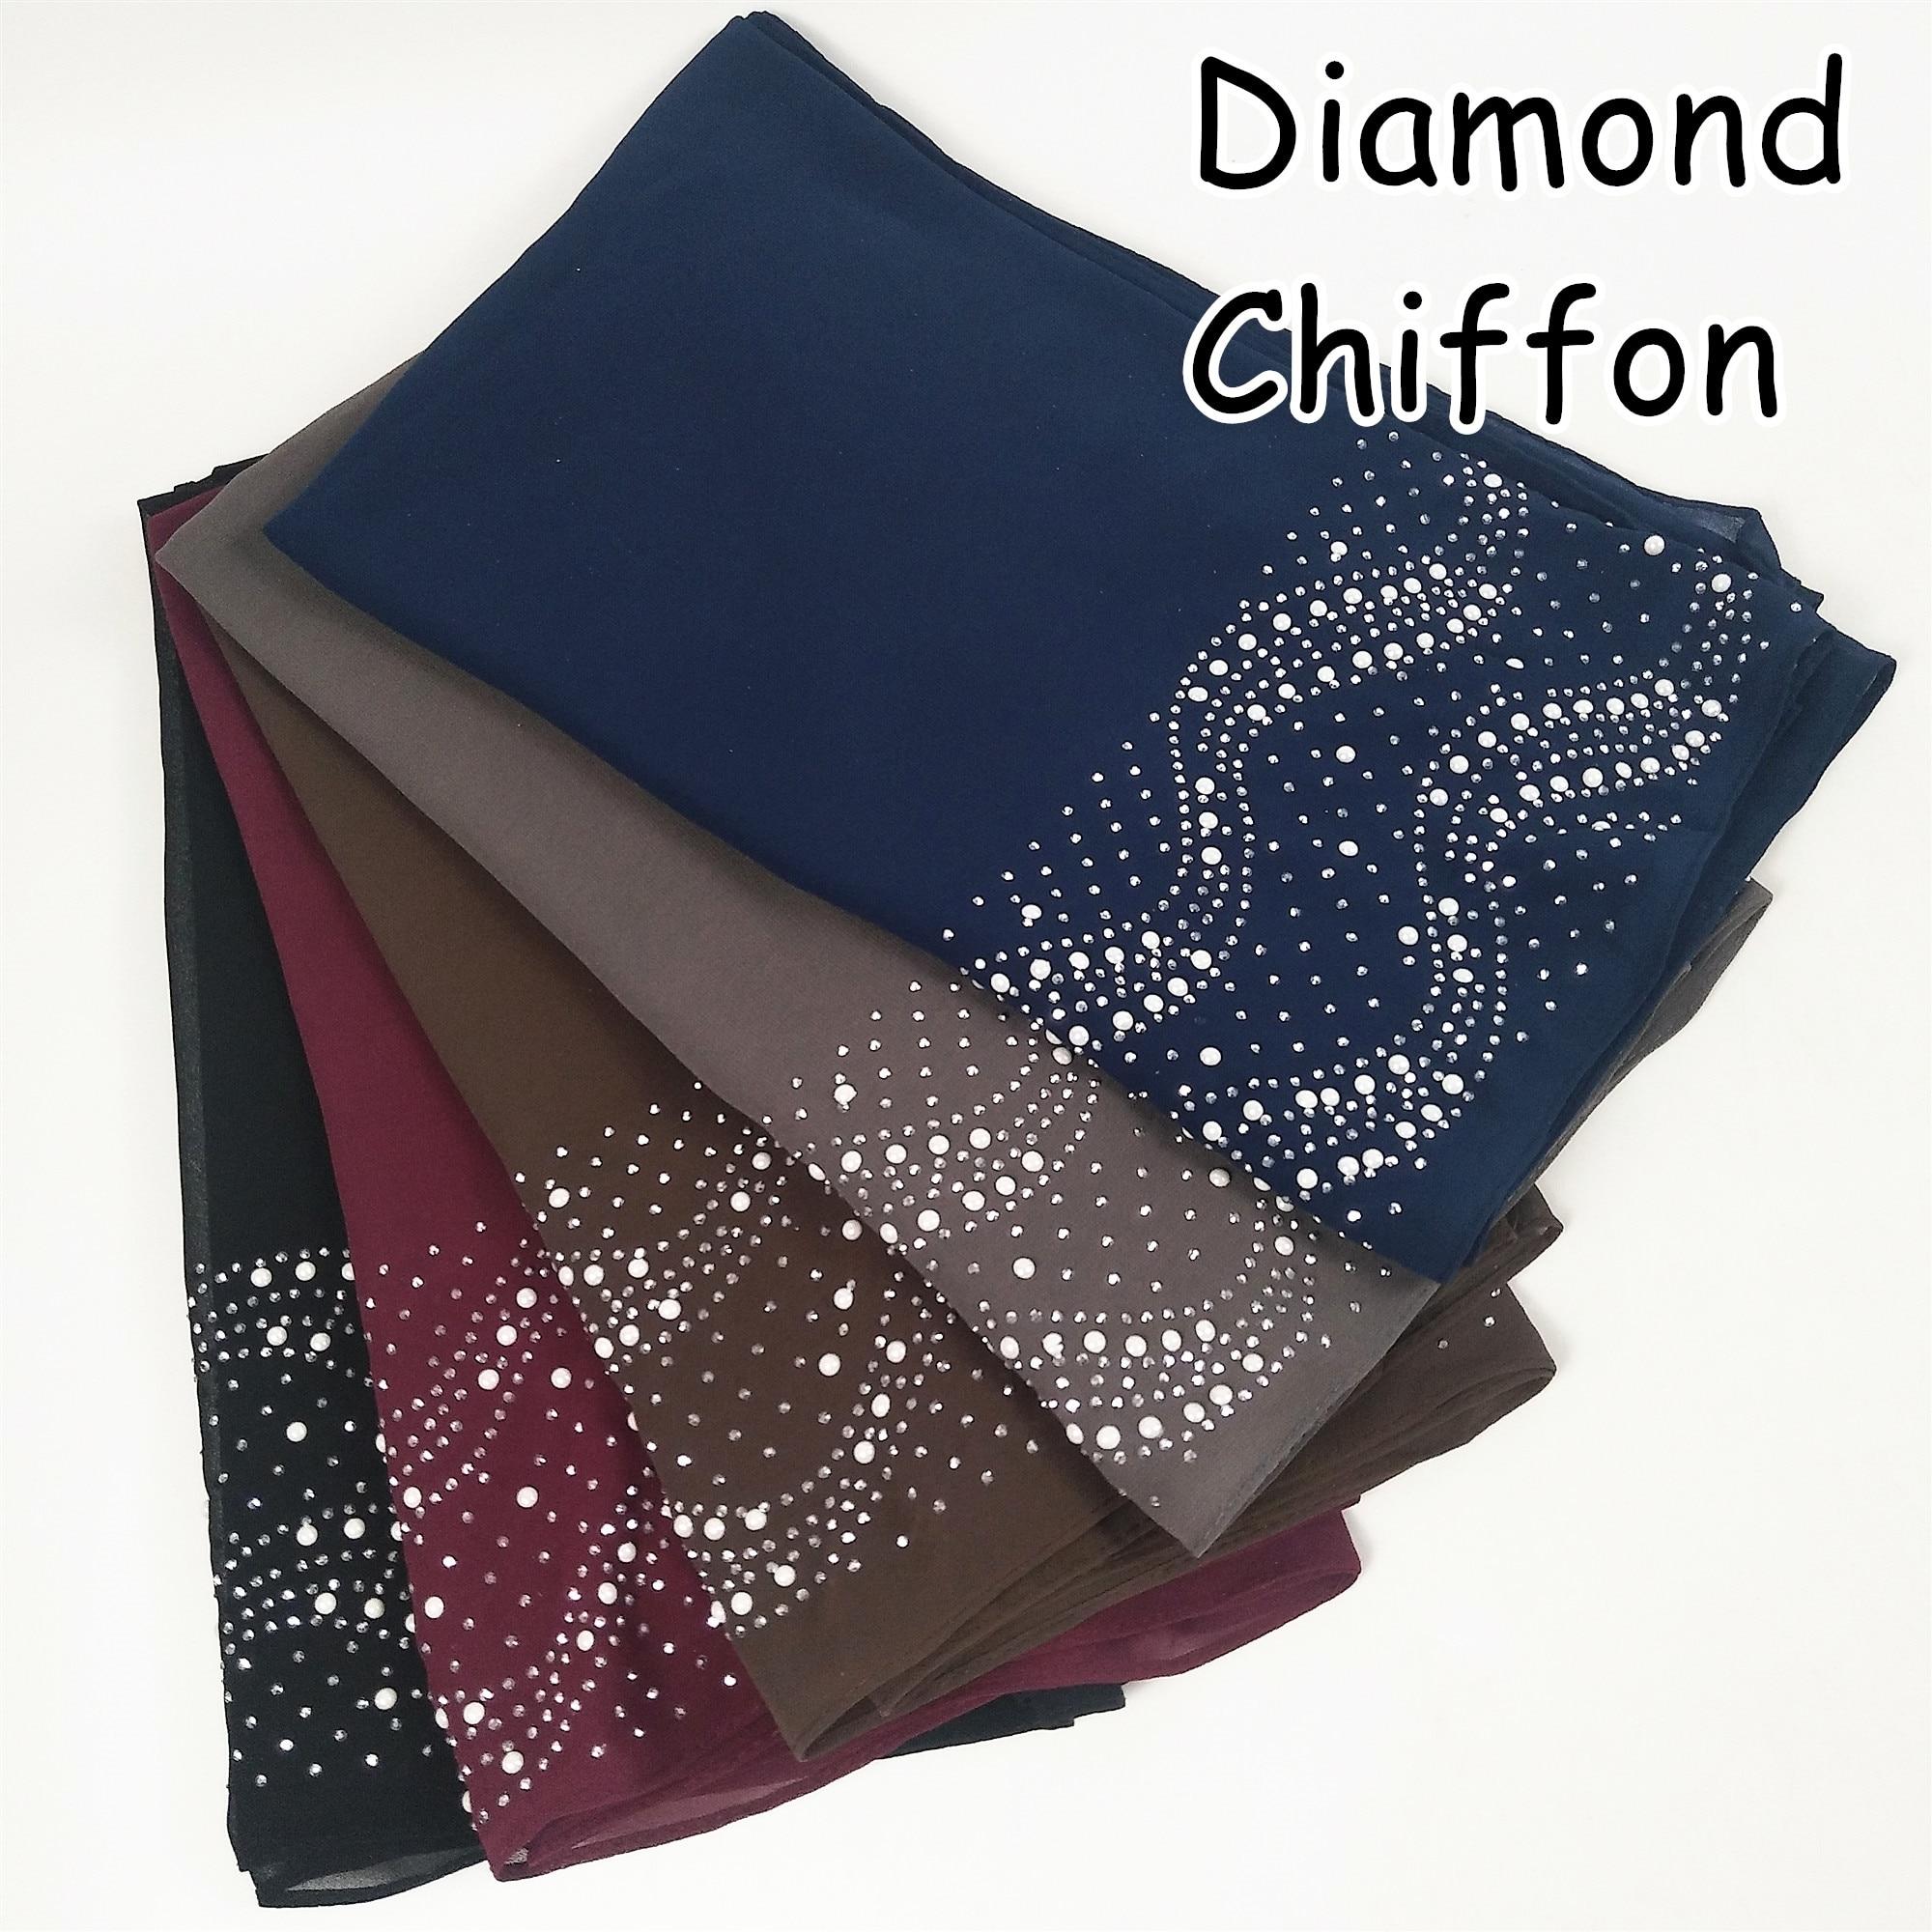 M91 High Quality Diamond Bubble Chiffon Hijab Wrap Shawls Lady Scarf Scarves  Headband 180*75cm 10pcs 1lot